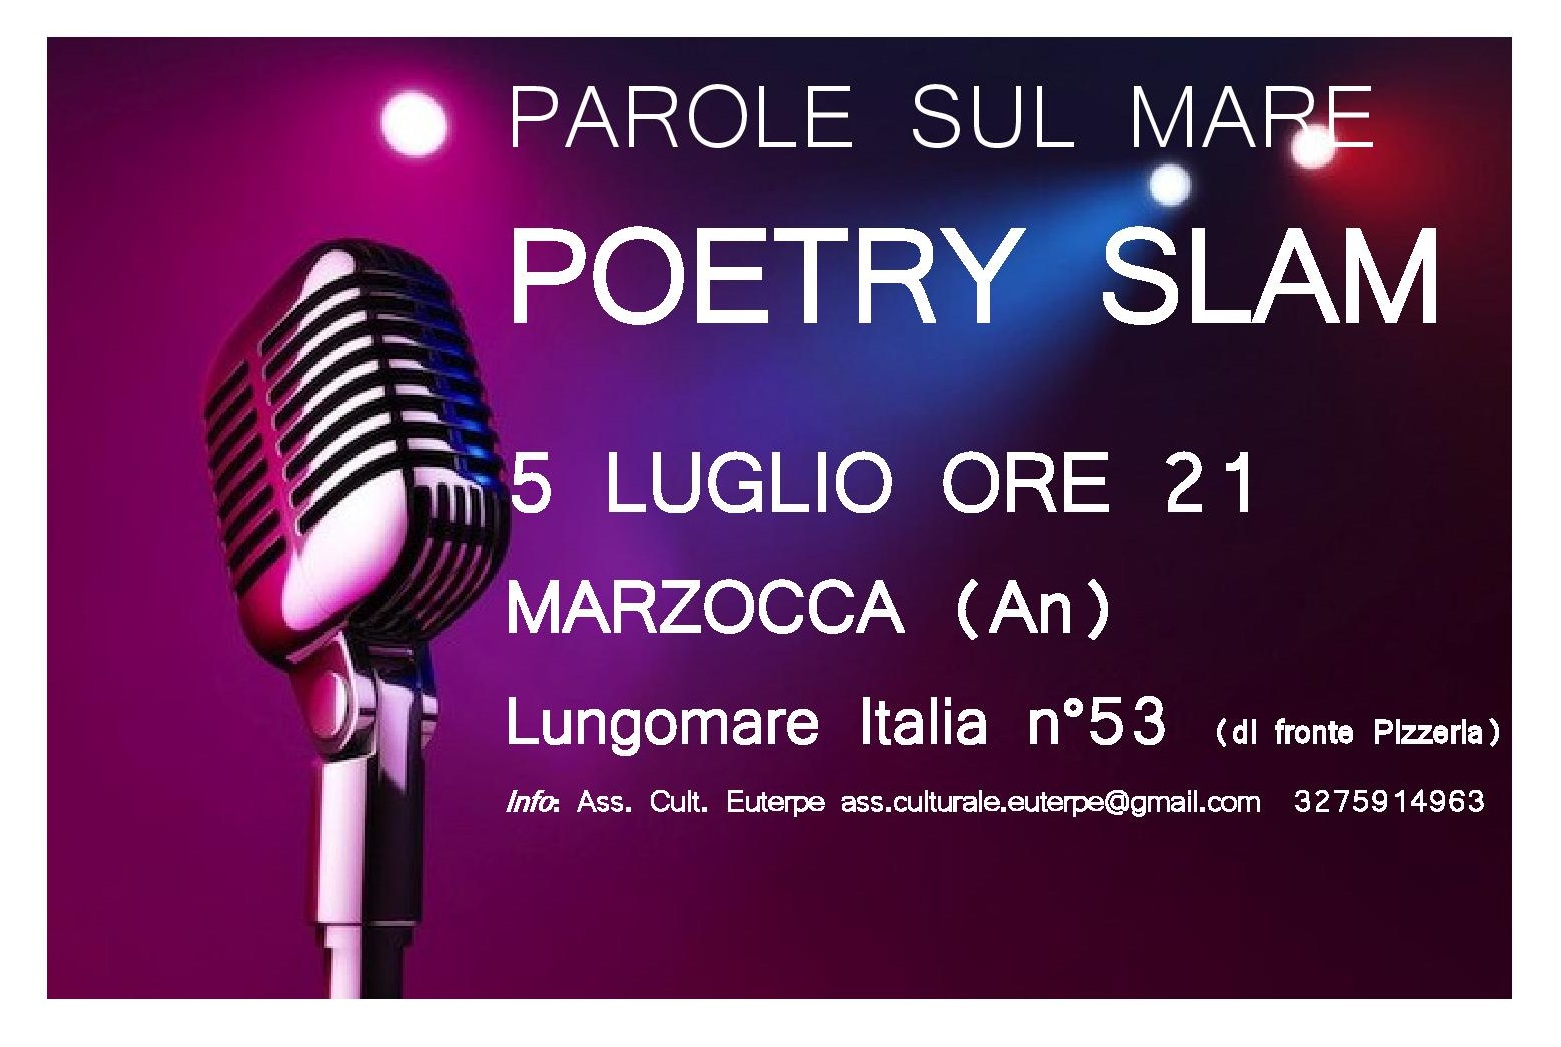 banner_poetryslam-page-001.jpg